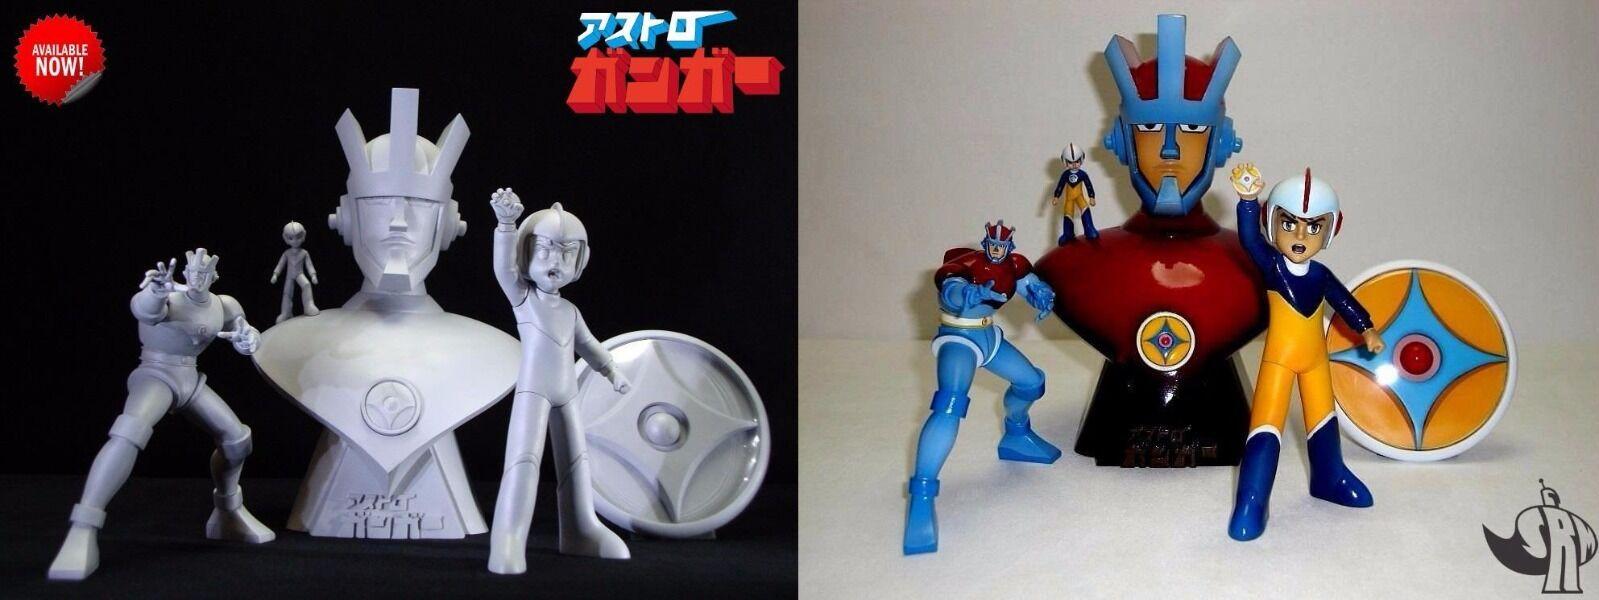 Anime model kit - Astroganger - Astroganga - アストロガンガー LOTTO